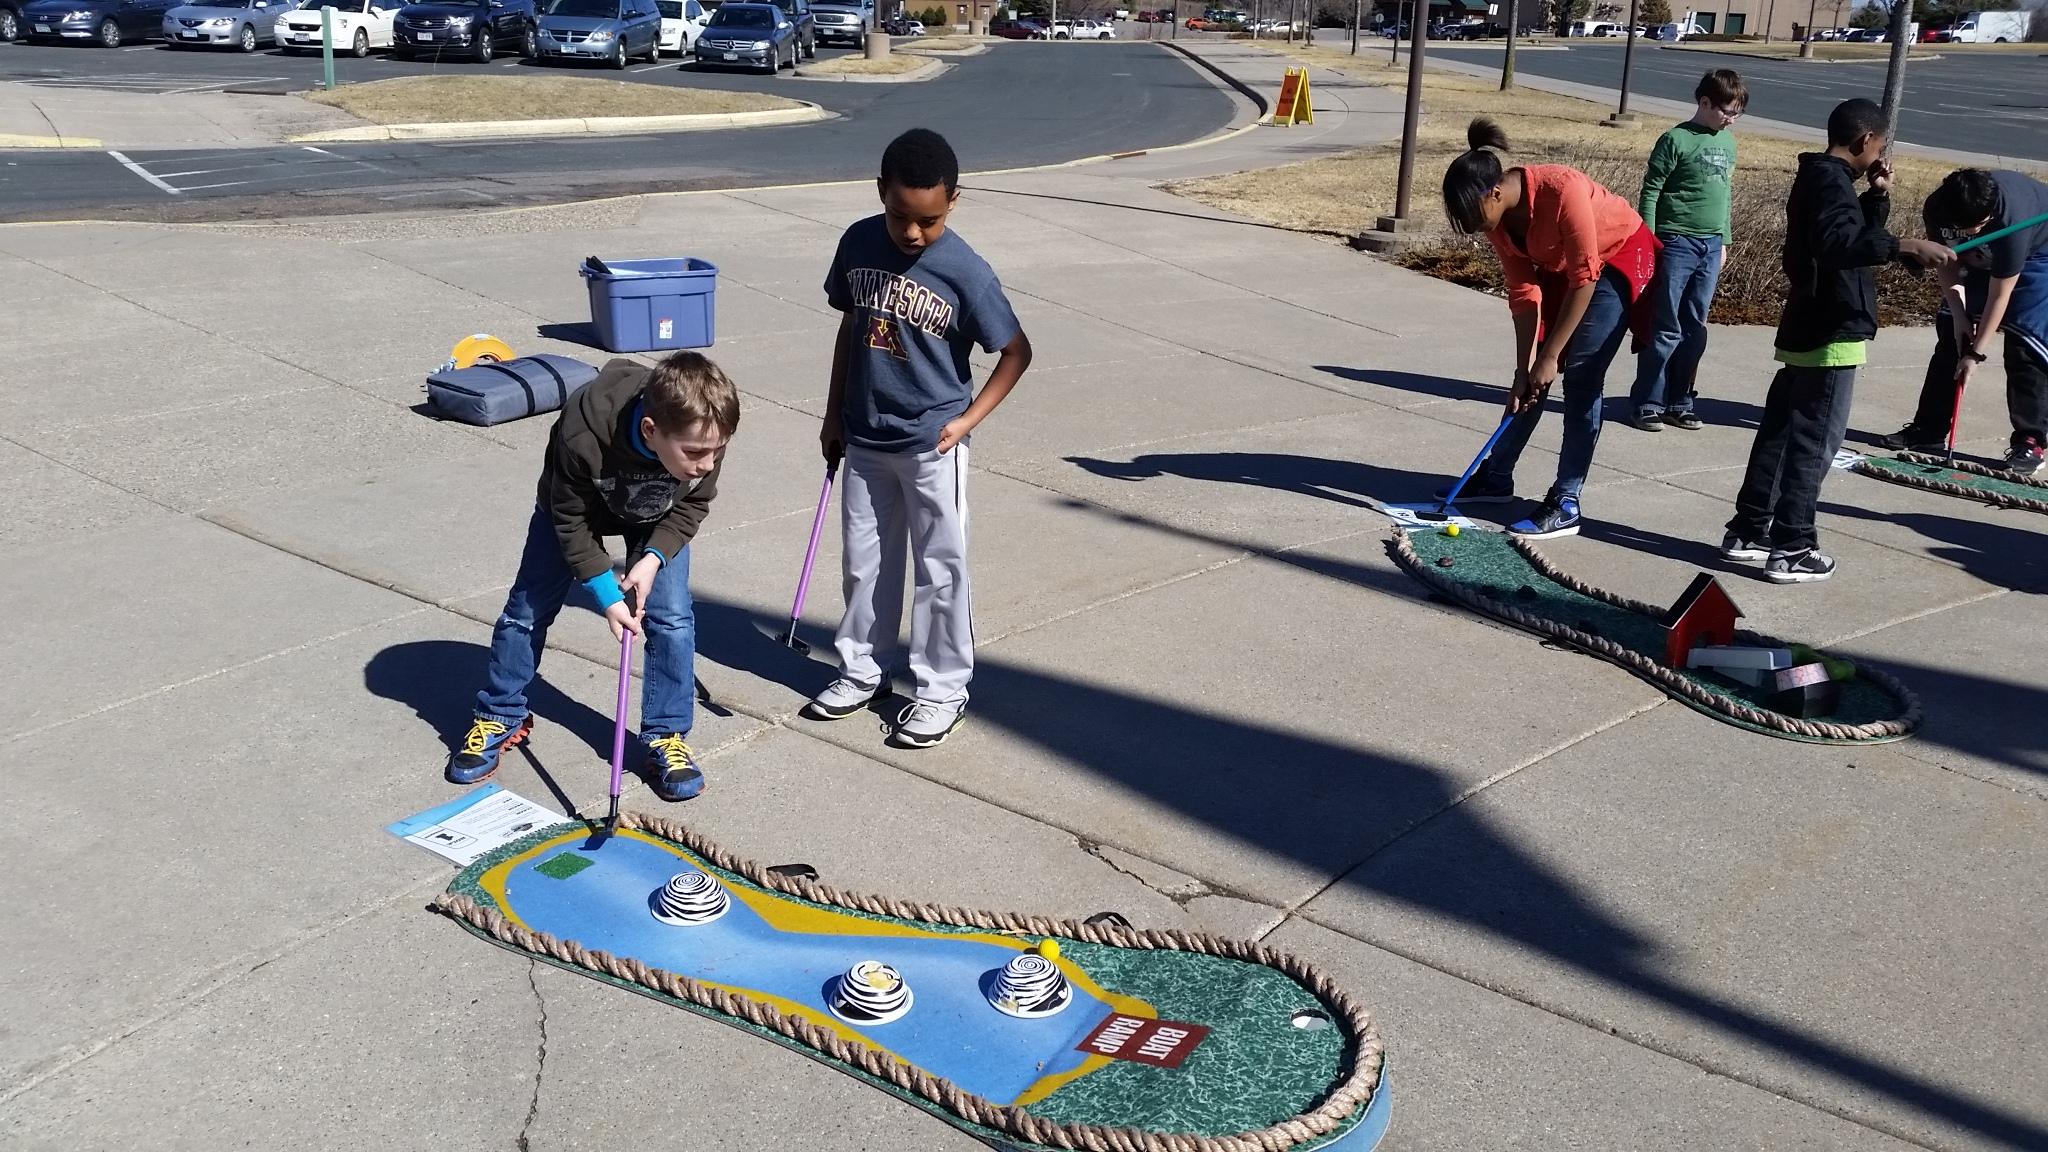 Kids playing putt putt in a parking lot